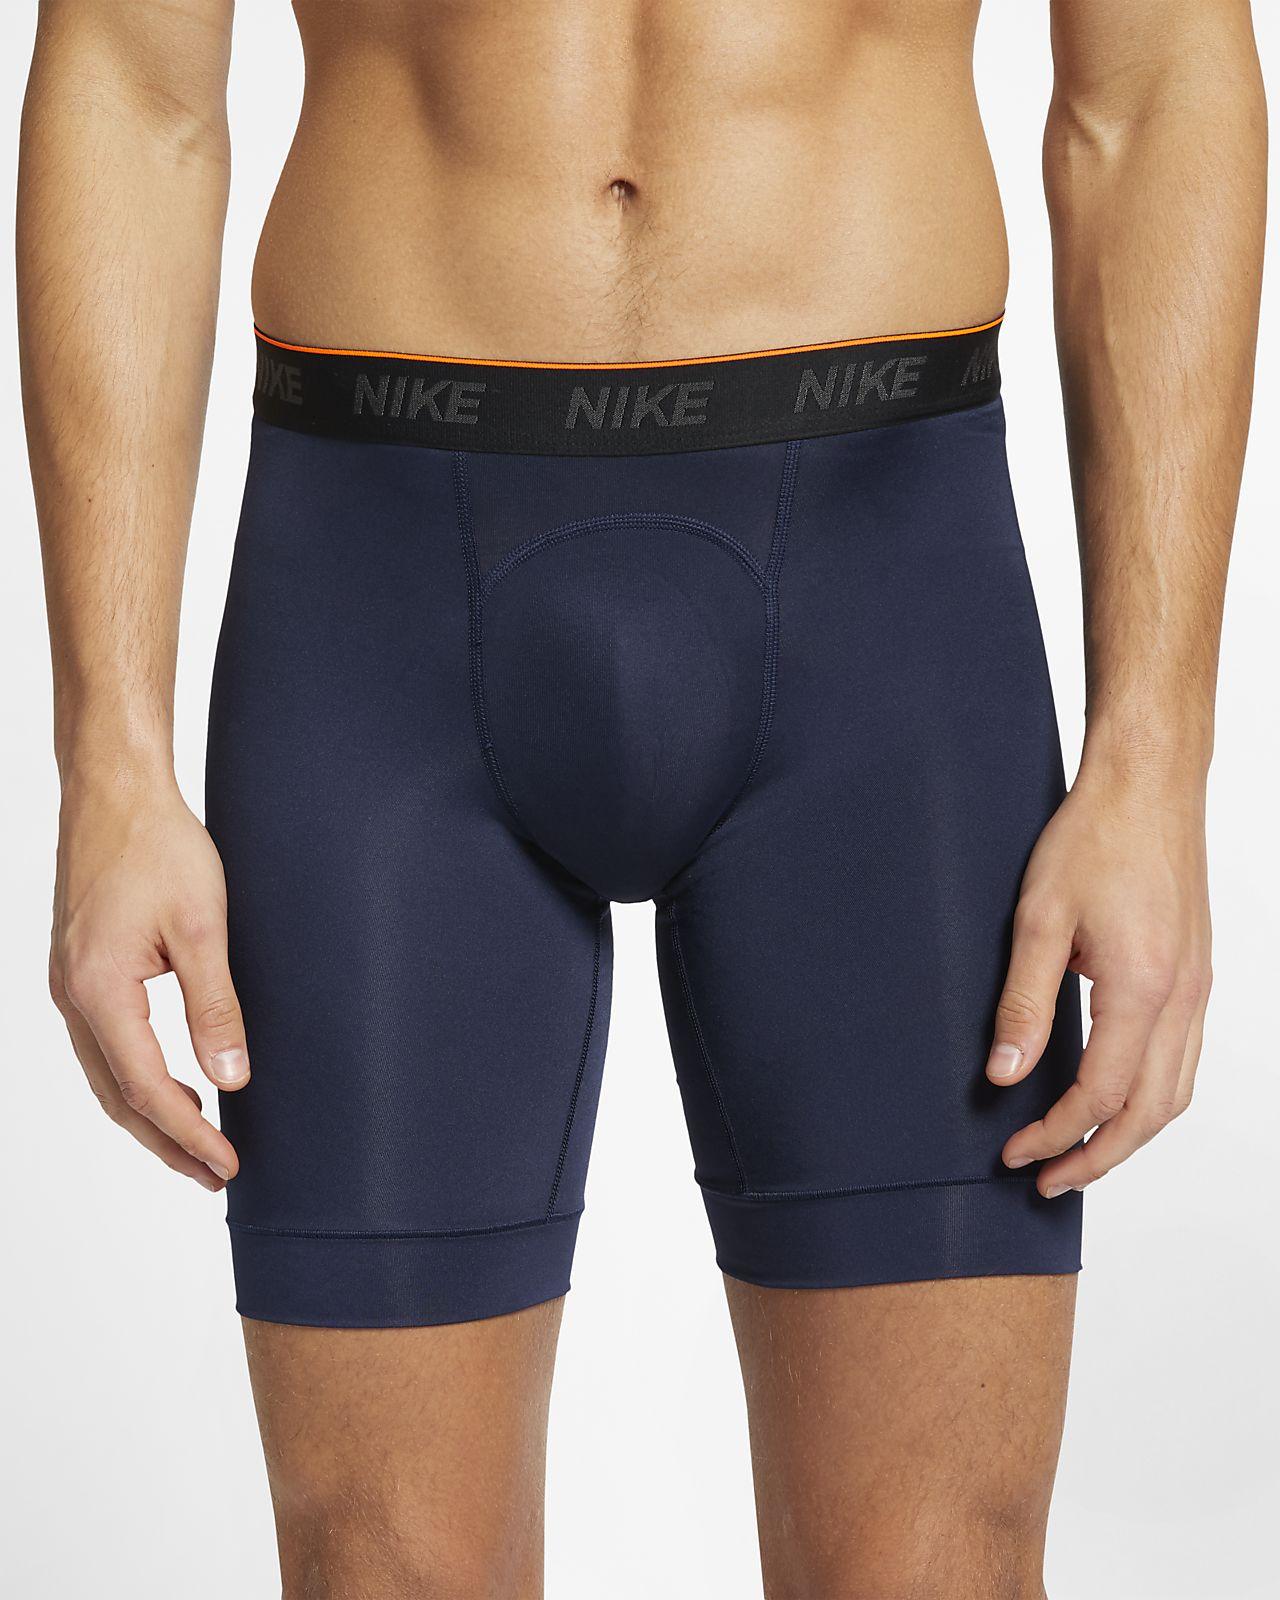 Nike  Men's Long Boxer Briefs (2 Pairs)